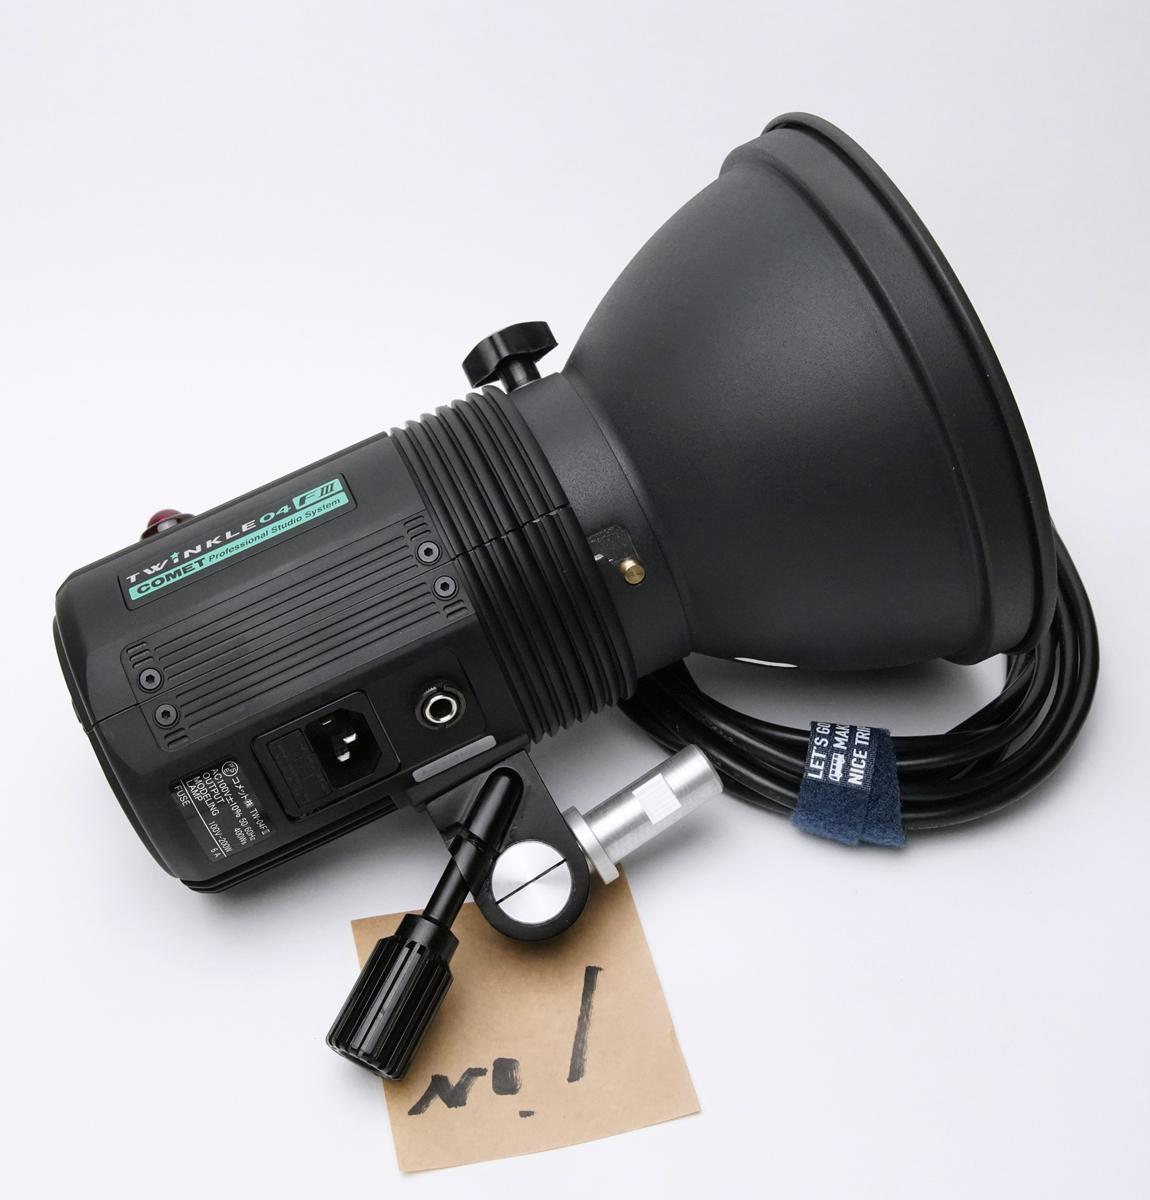 COMET コメット TWINKLE 04F III + CX-Cリフレクター テスト発光のみ美品